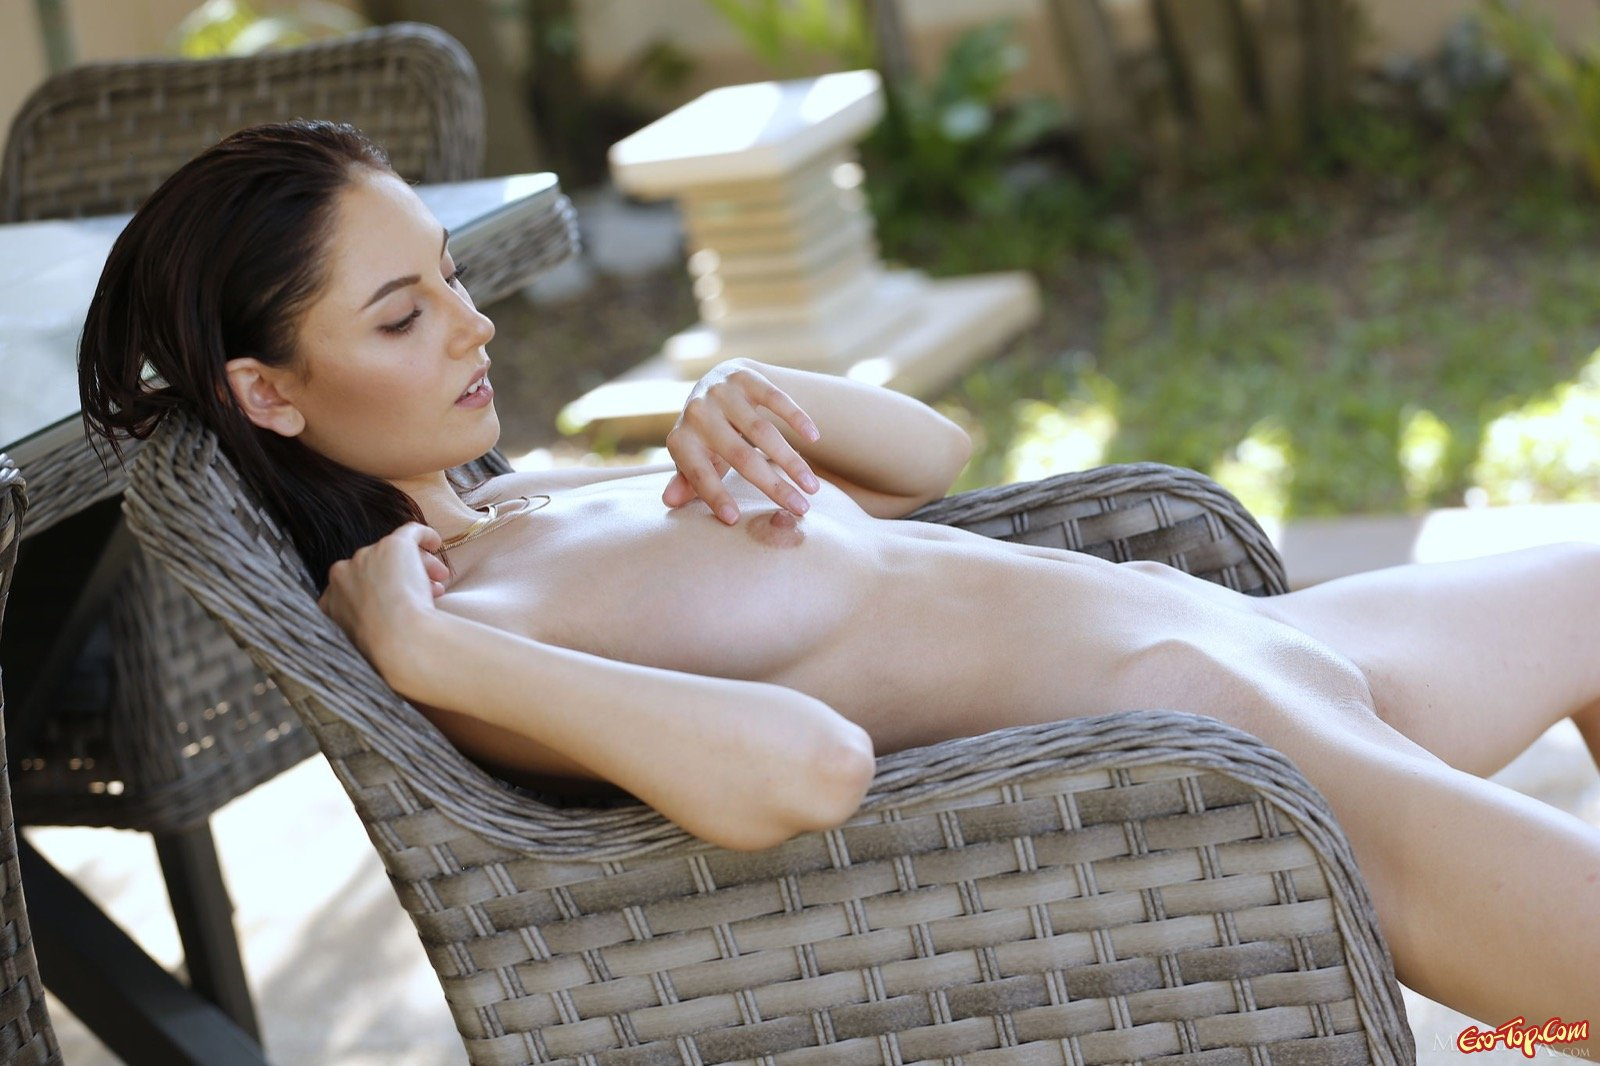 Милашка снимает купальник и позирует у бассейна